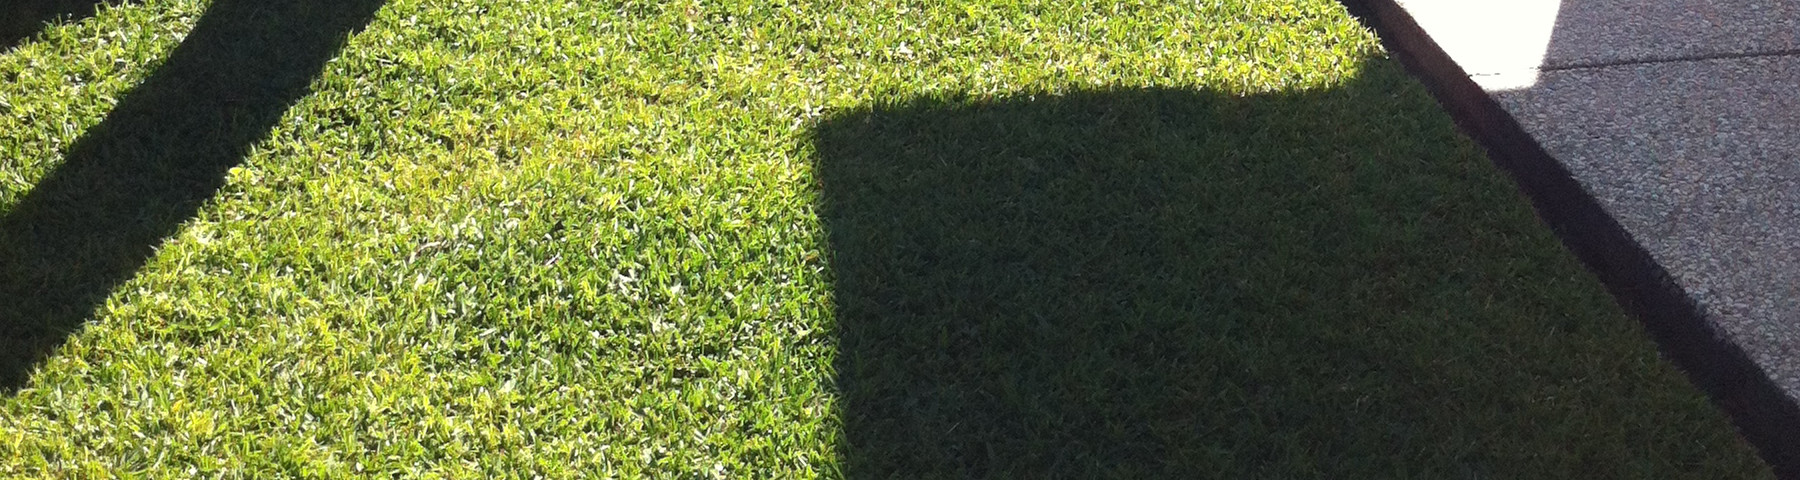 Turfs & Grass Seed